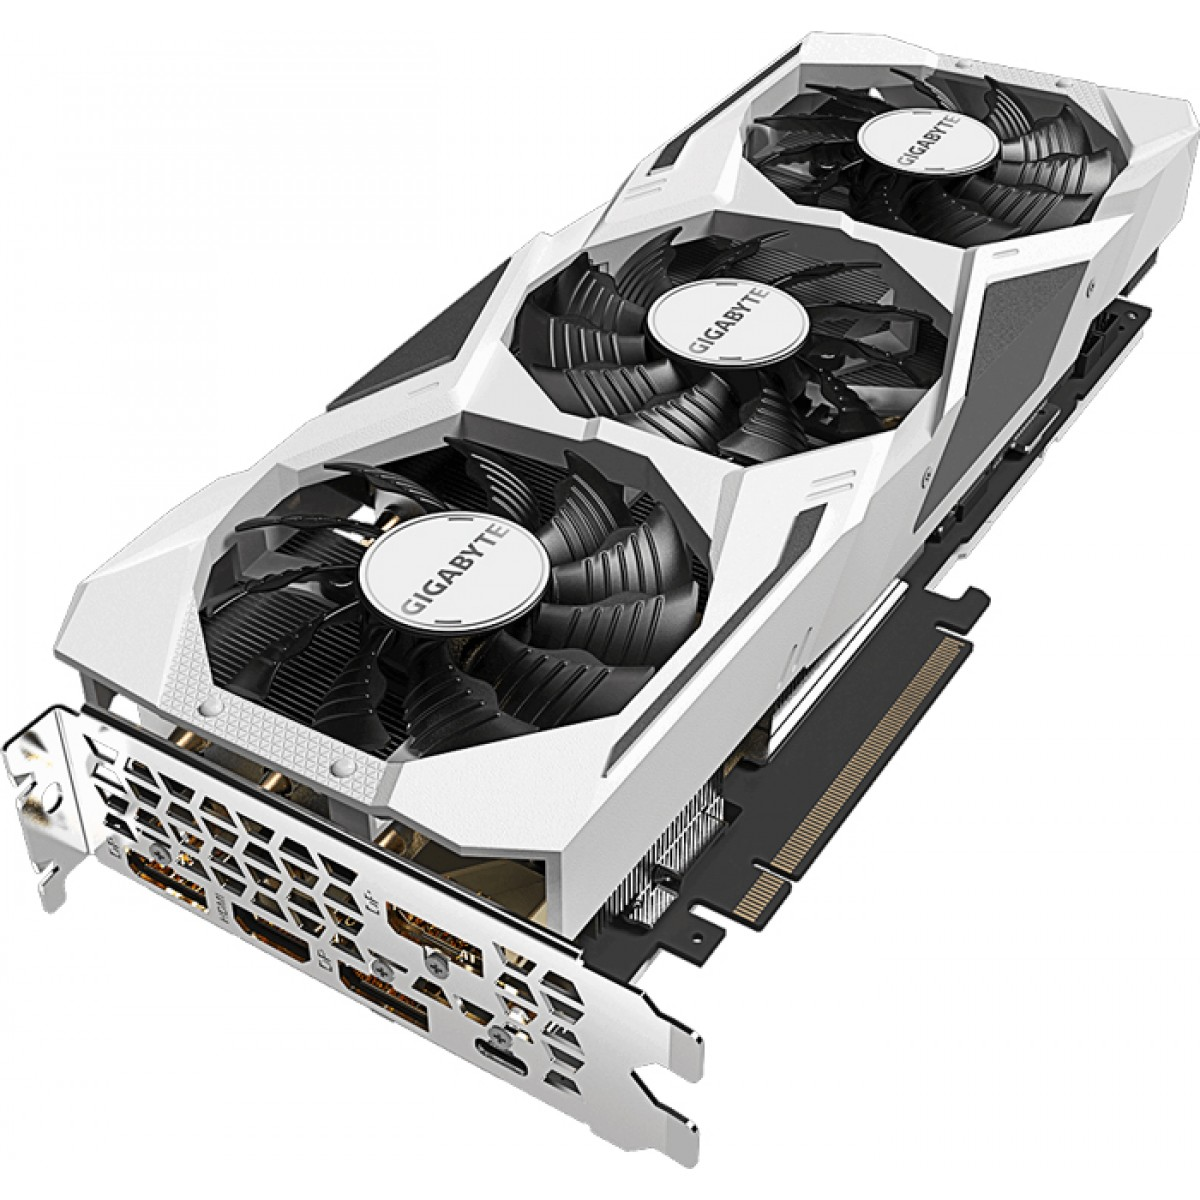 Placa de Vídeo Gigabyte GeForce RTX 2070 Super Gaming OC, 8GB GDDR6, 256Bit, White